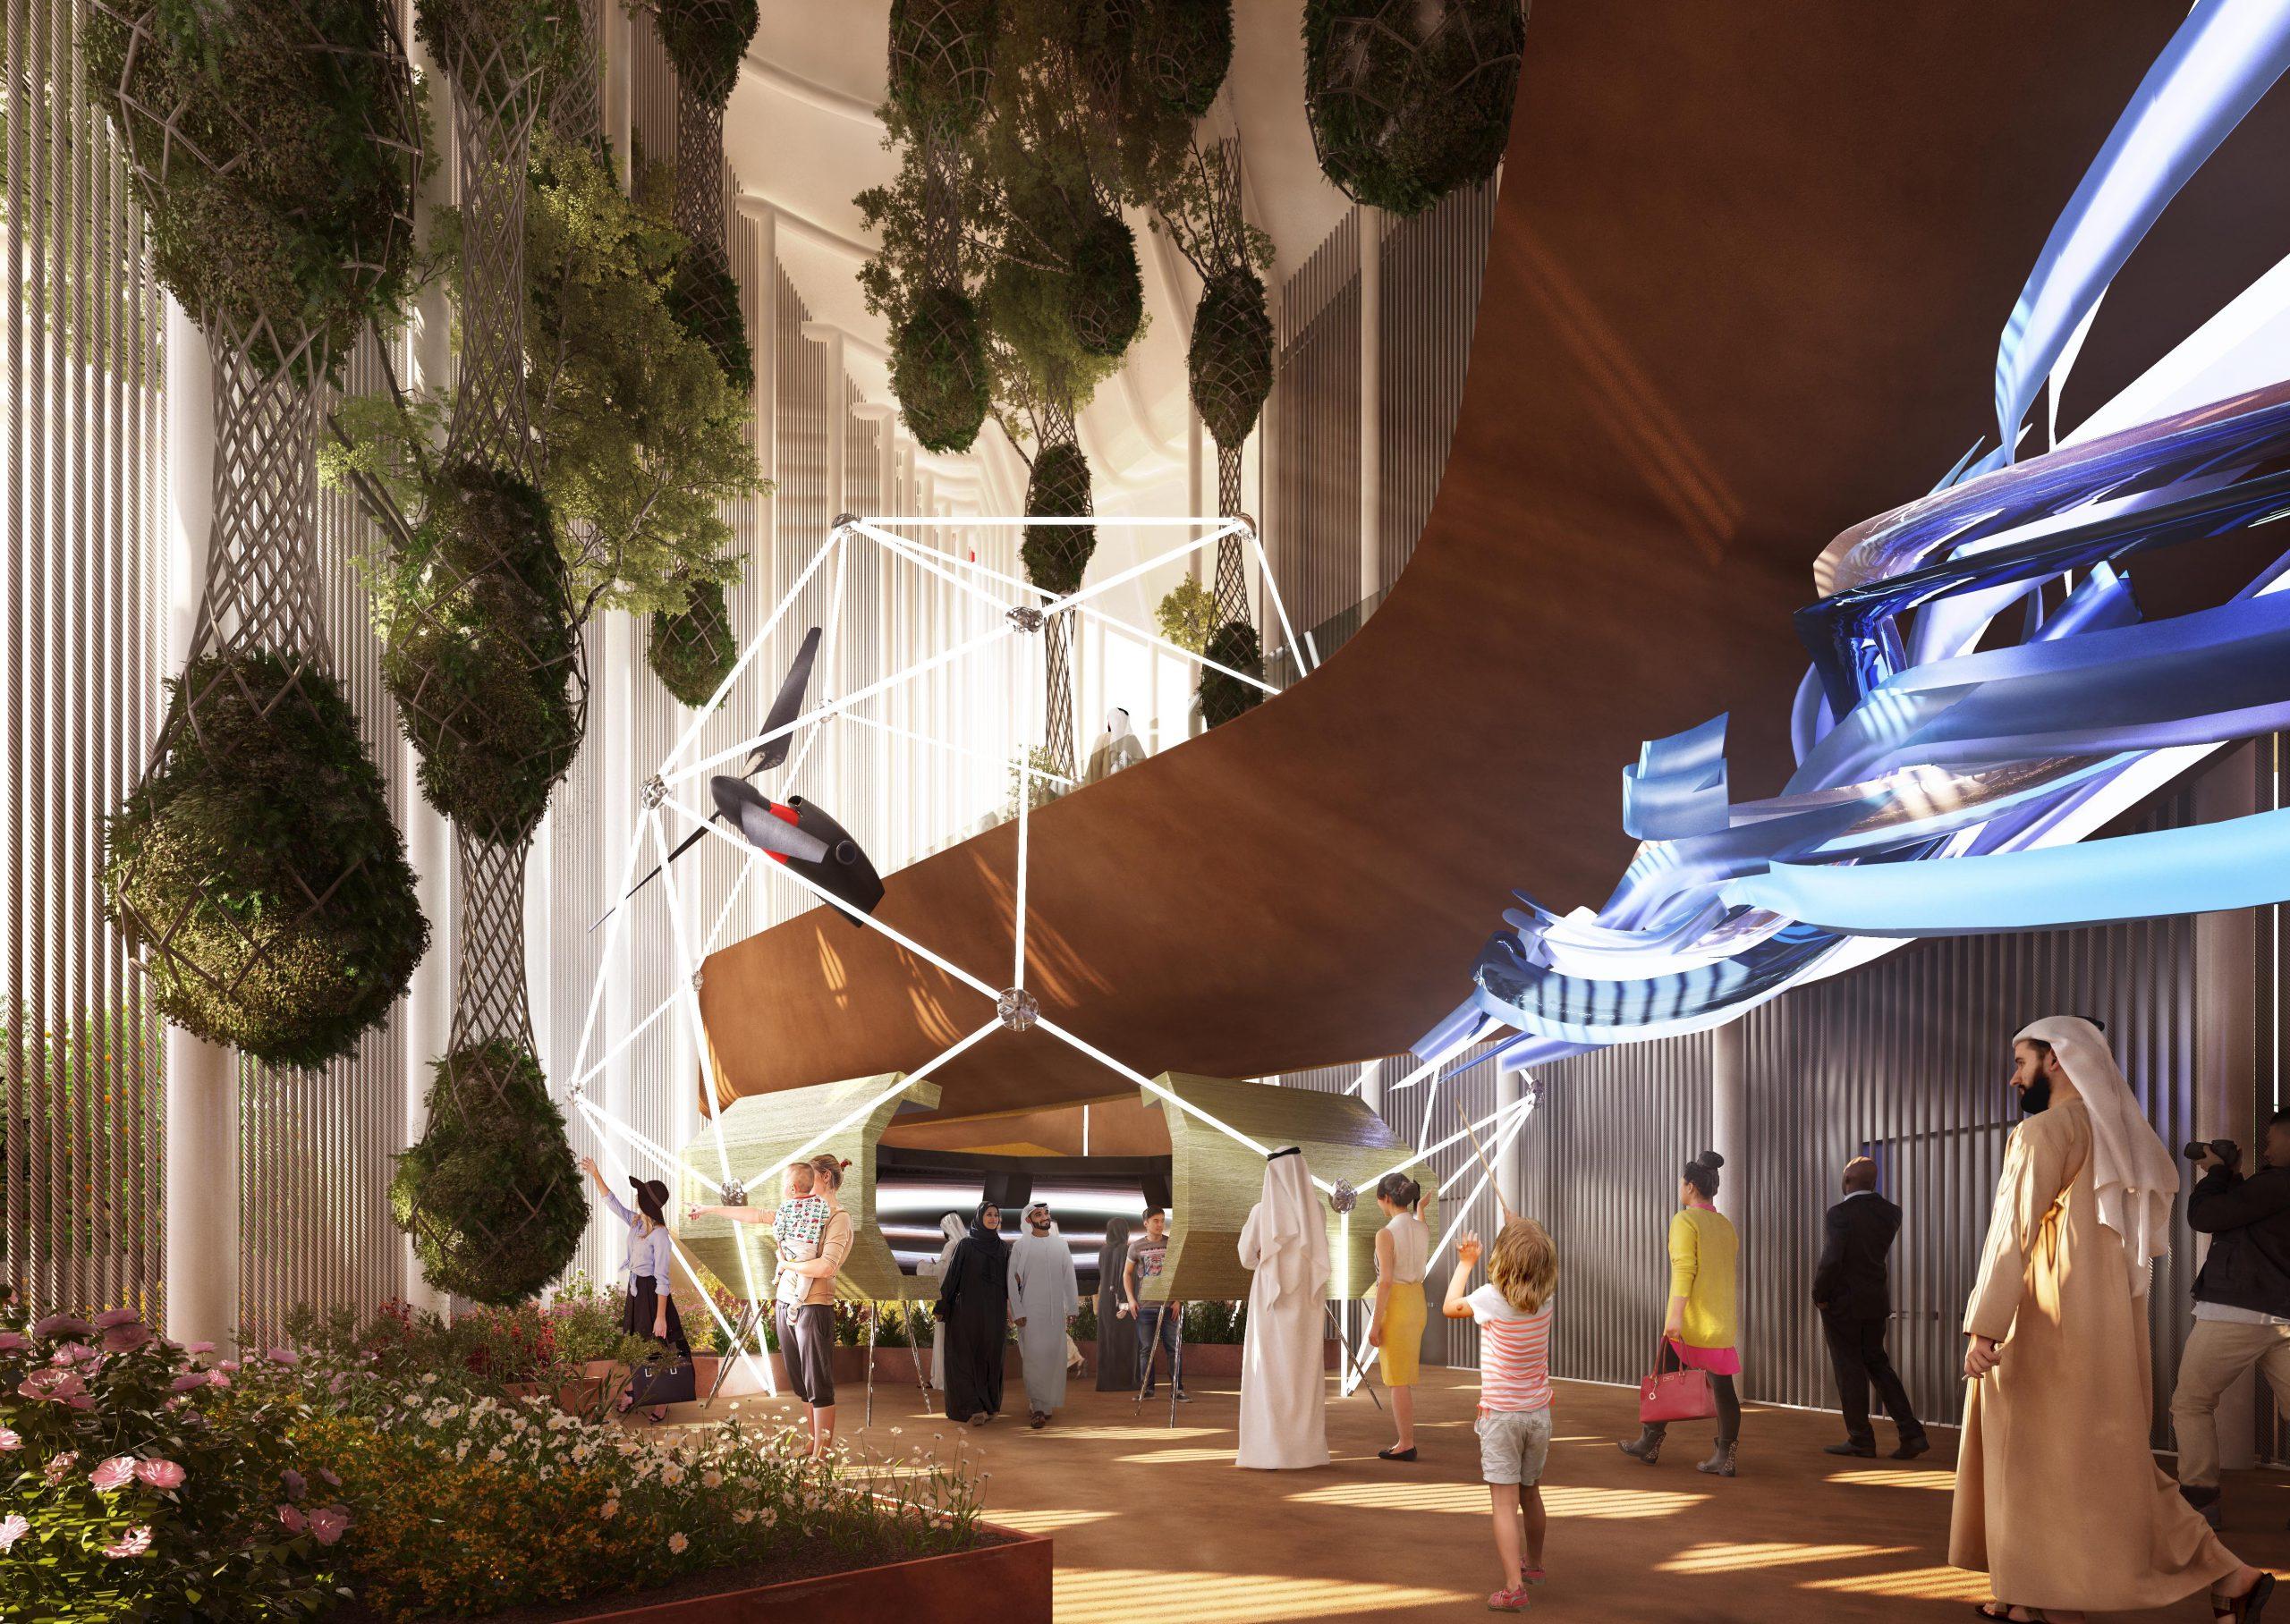 201910 Unveiling Italian Pavilion 2020_Renderings by CRA_5